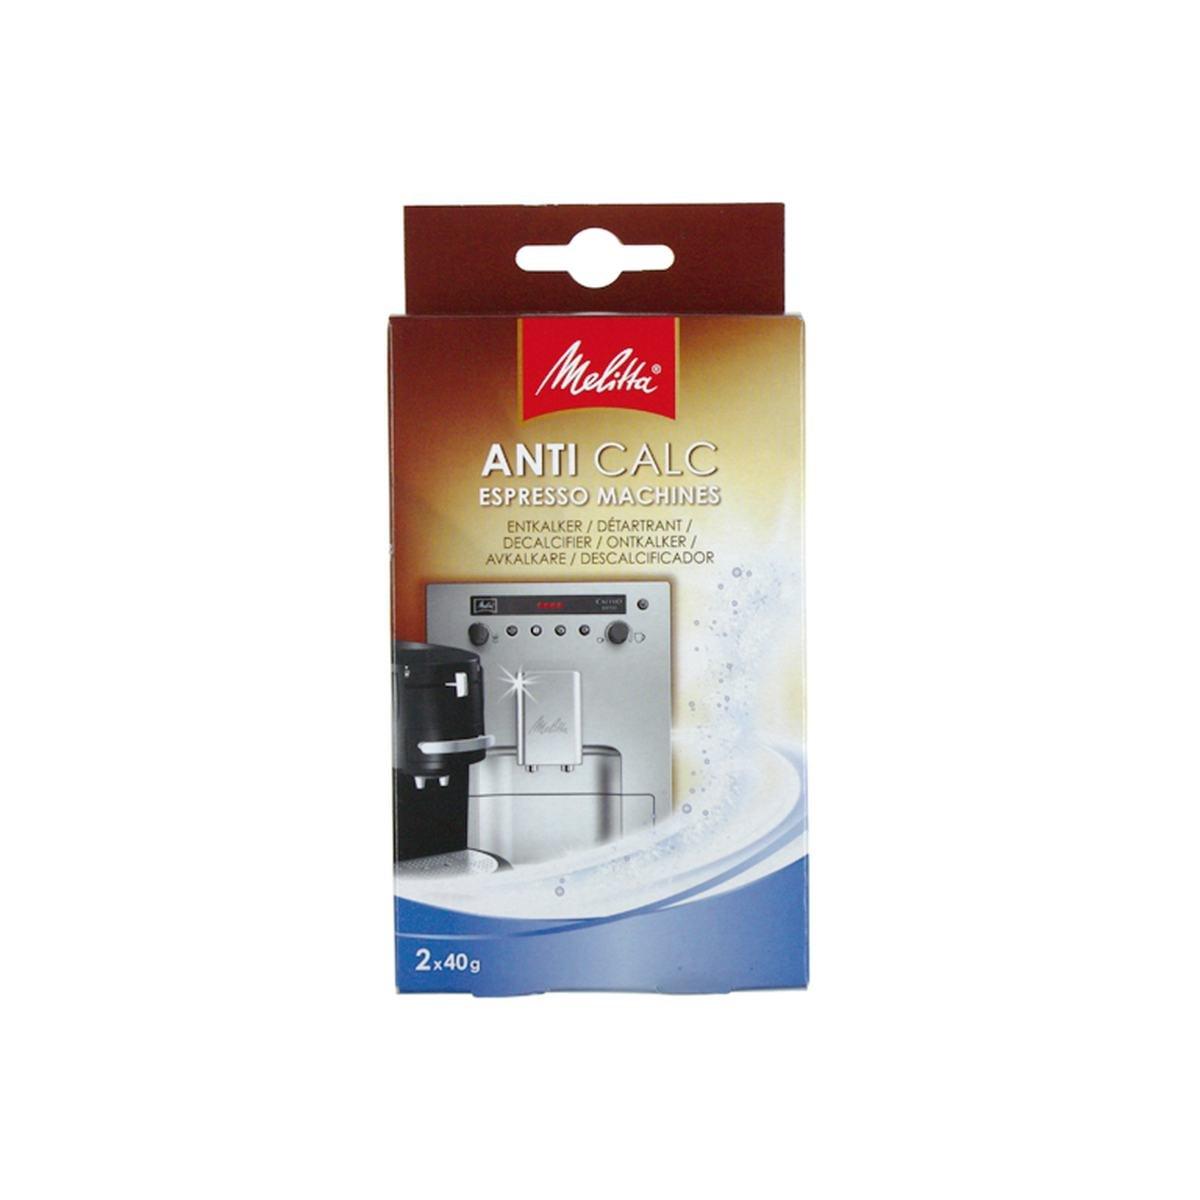 Afkalker Anti Calc 2 x 40 gram Espresso